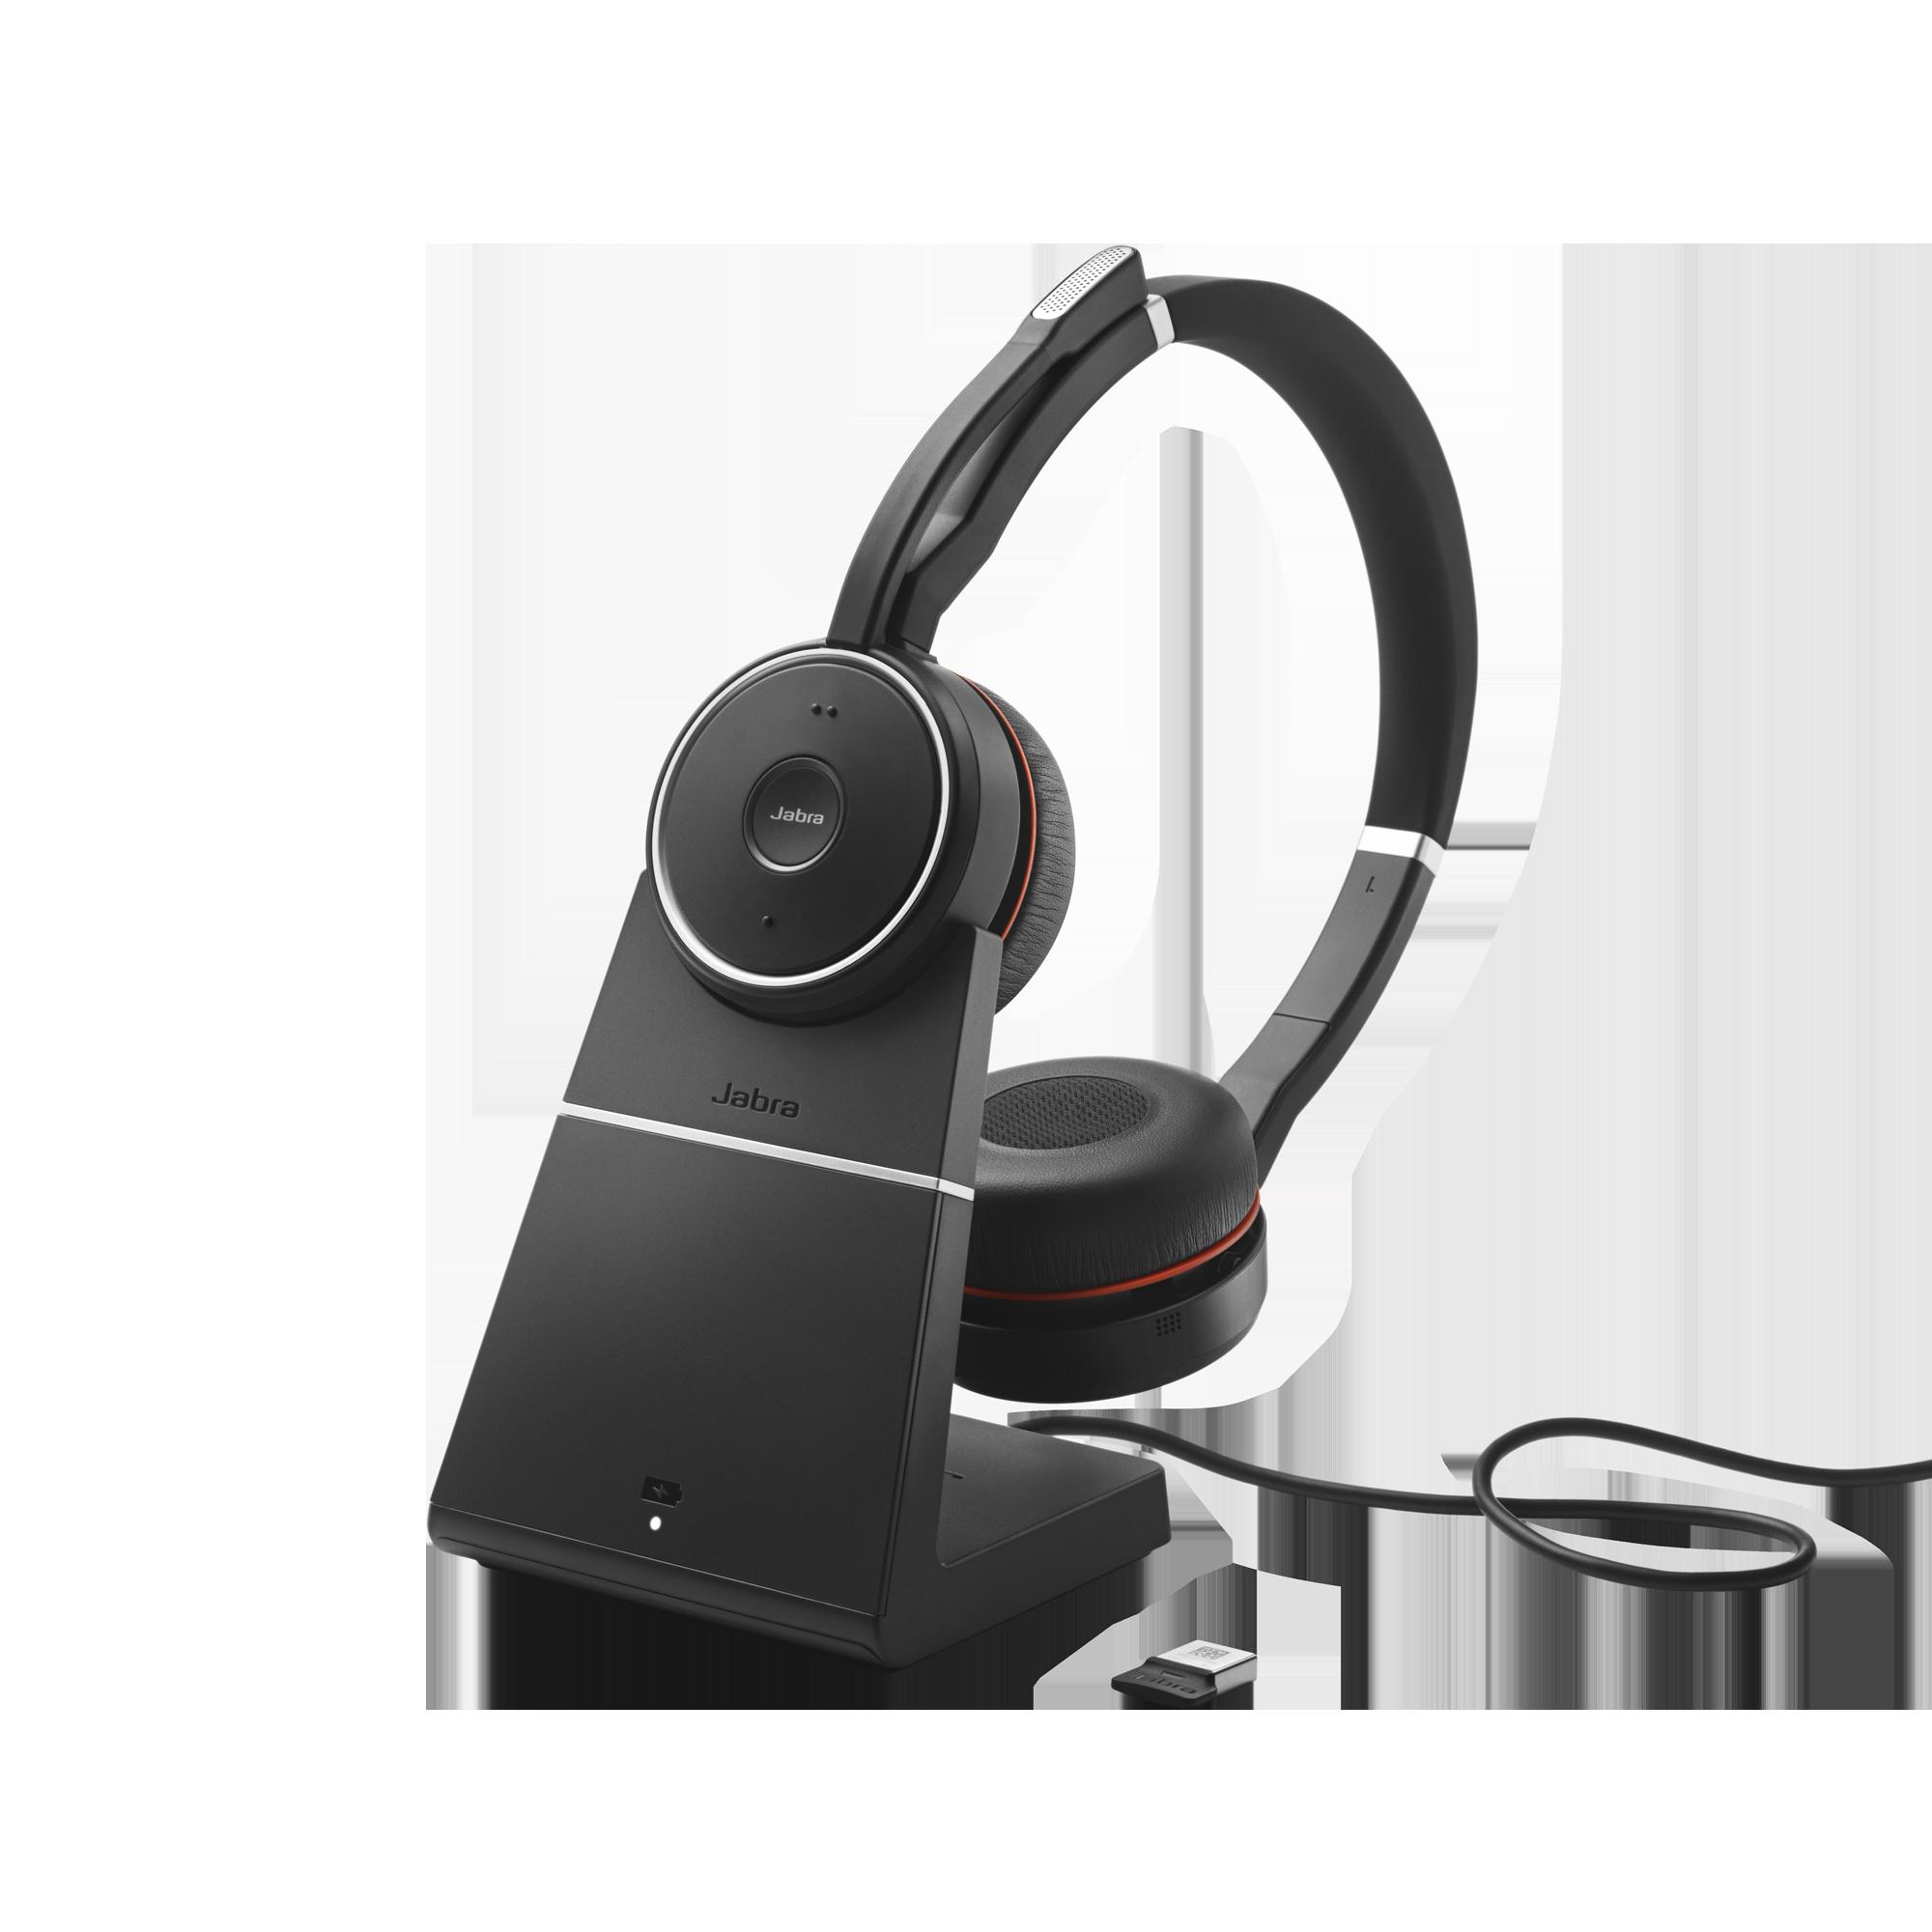 Jabra Evolve 75, Duo, USB-BT, MS, stojánek - 7599-832-199